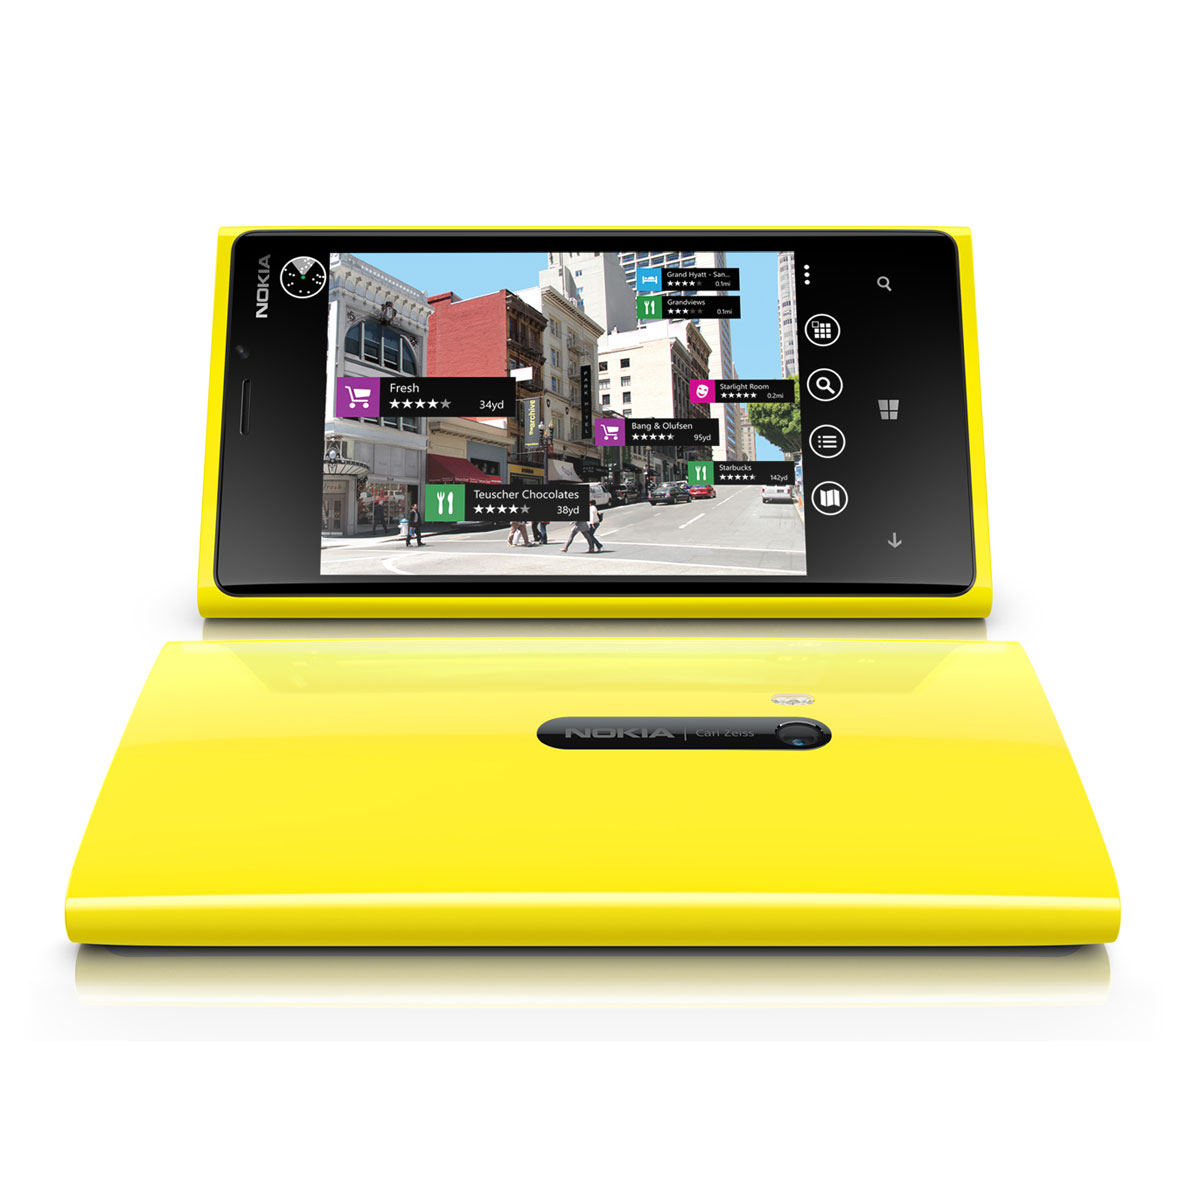 Nokia lumia 920 jaune mobile smartphone nokia sur for Photo ecran lumia 920